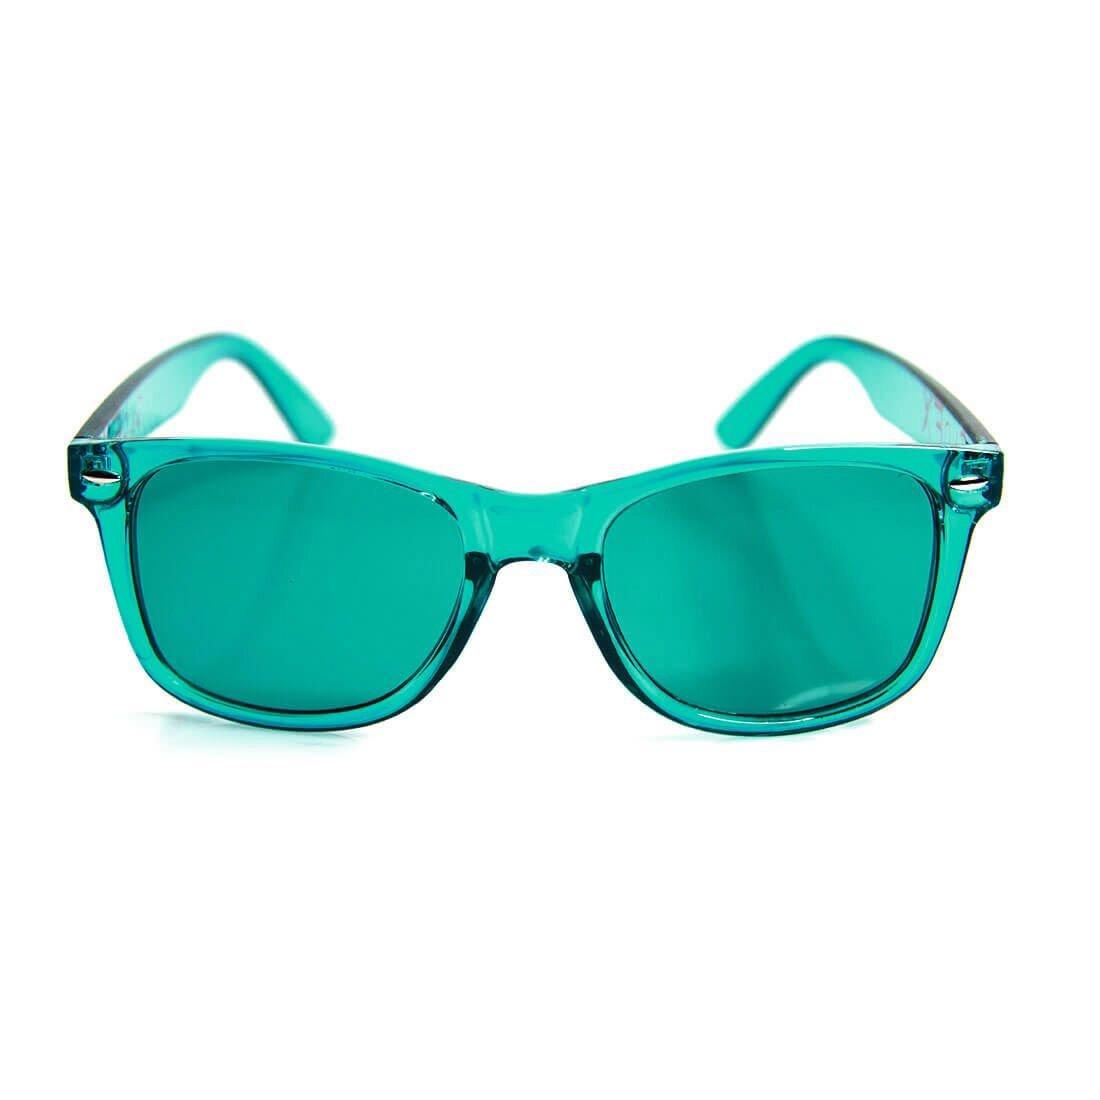 c521f78b263 Amazon.com  GloFX Aqua Color Therapy Glasses Chakra Glasses Relax Glasses   Clothing